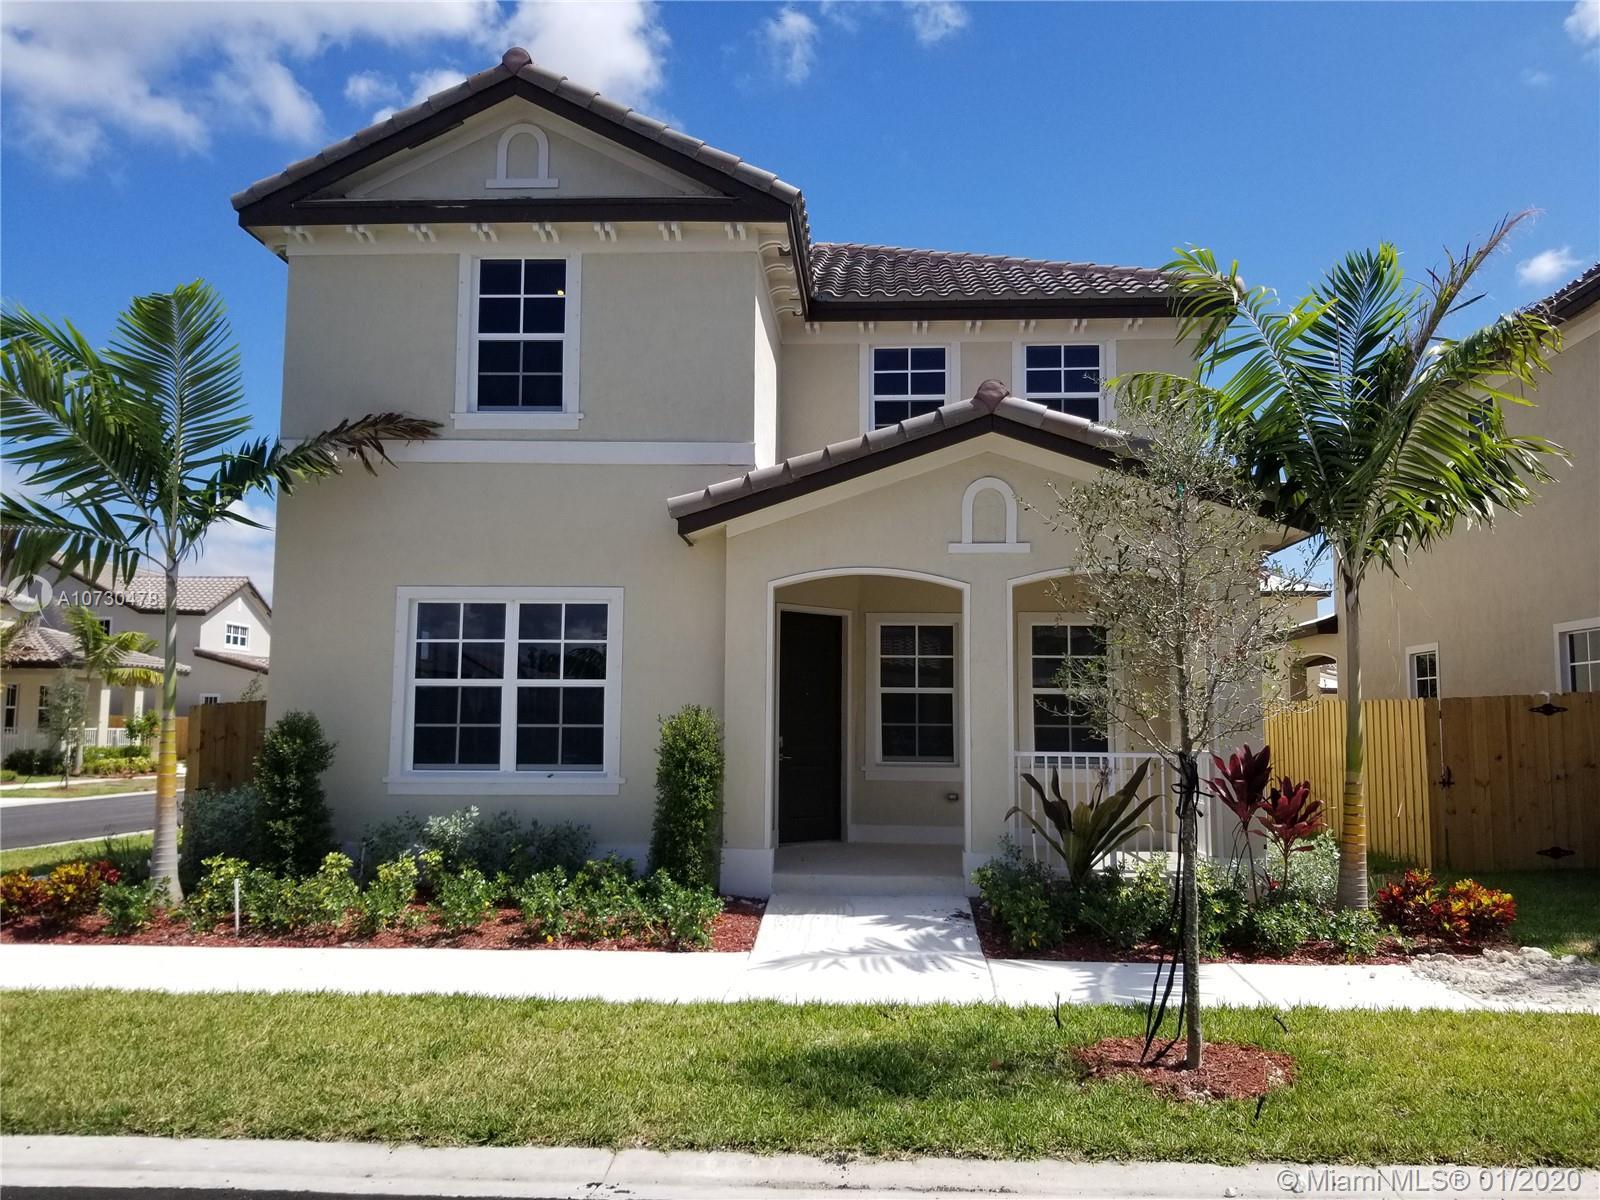 24301 SW 117th Path, Homestead, FL 33032 - Homestead, FL real estate listing